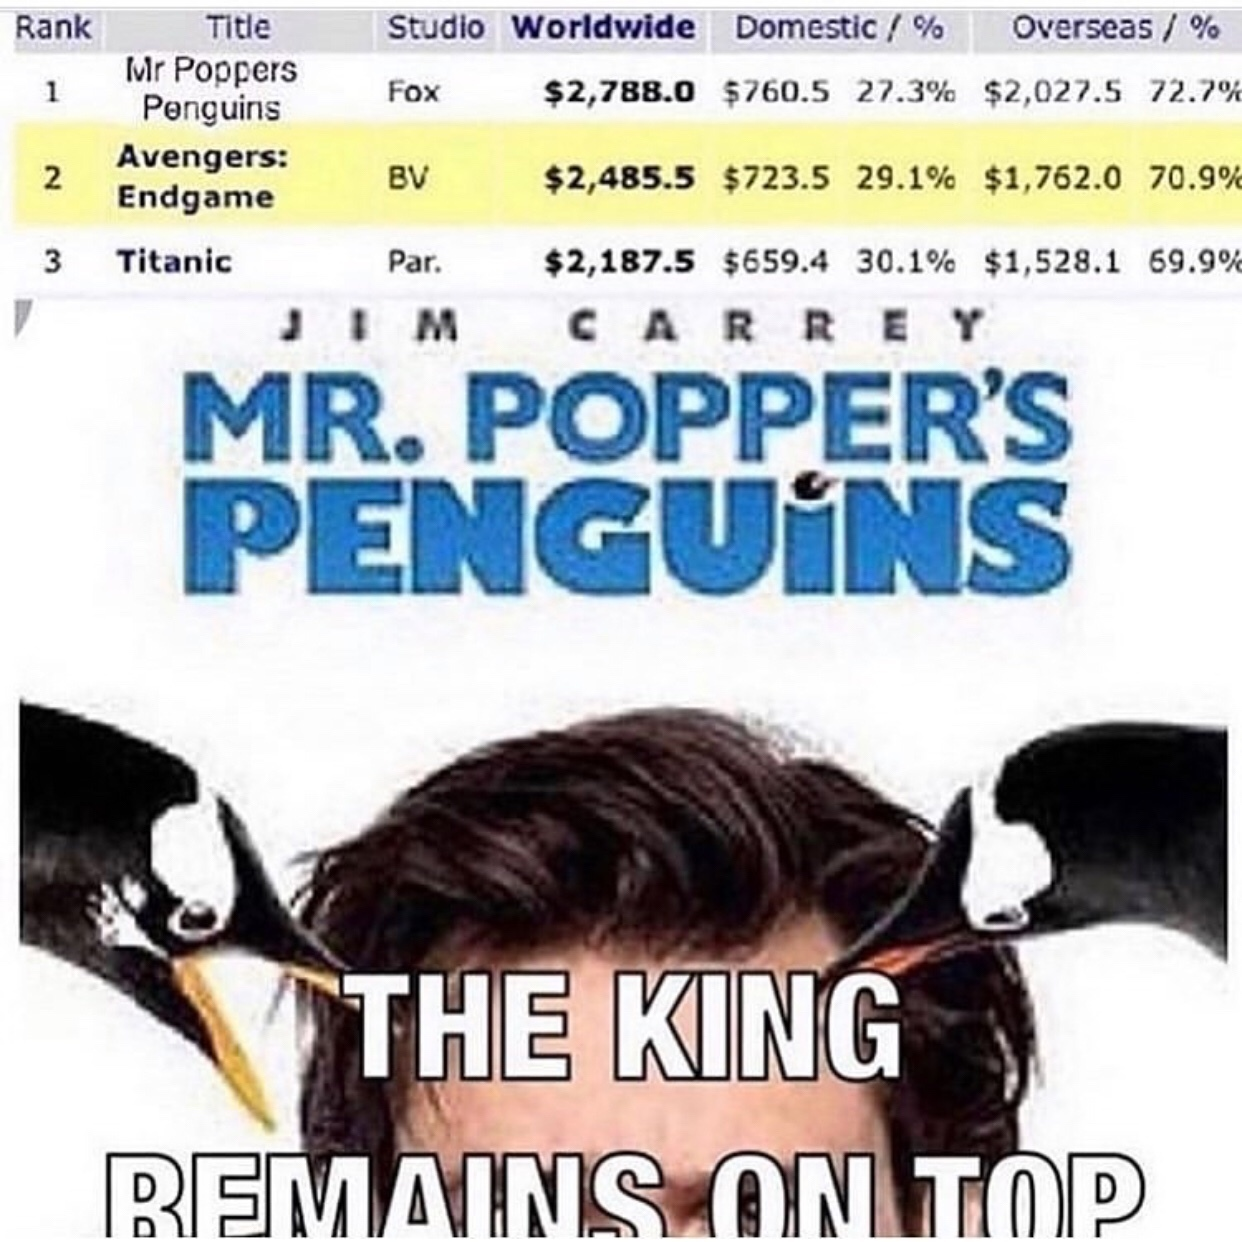 the king - meme